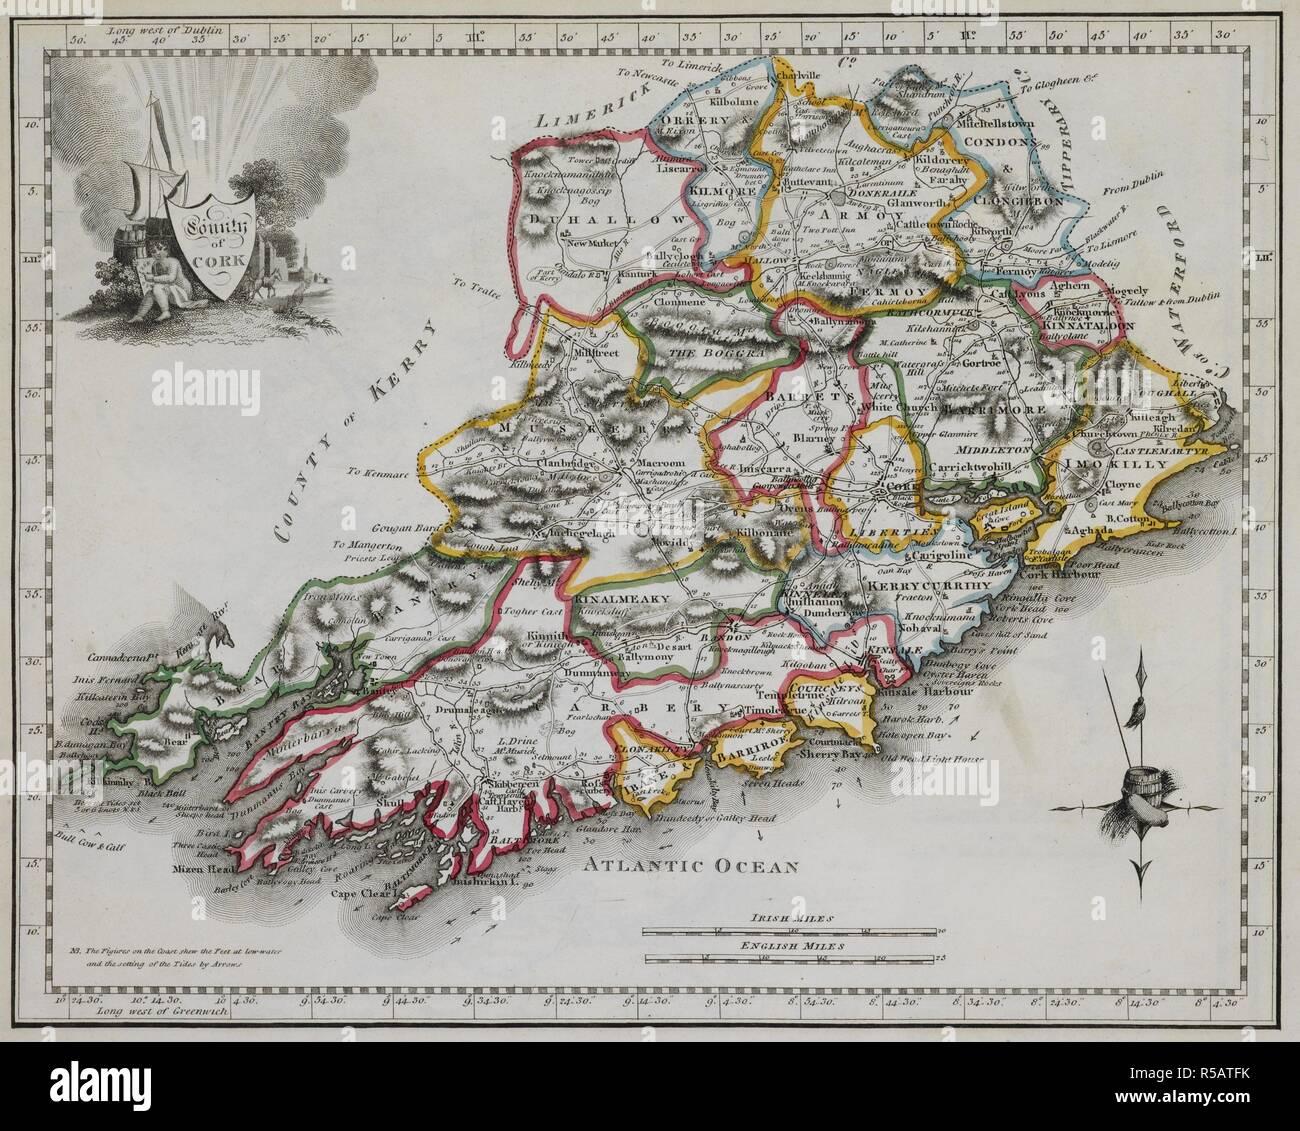 Map Of Ireland 32.32 County Ireland Stock Photos 32 County Ireland Stock Images Alamy